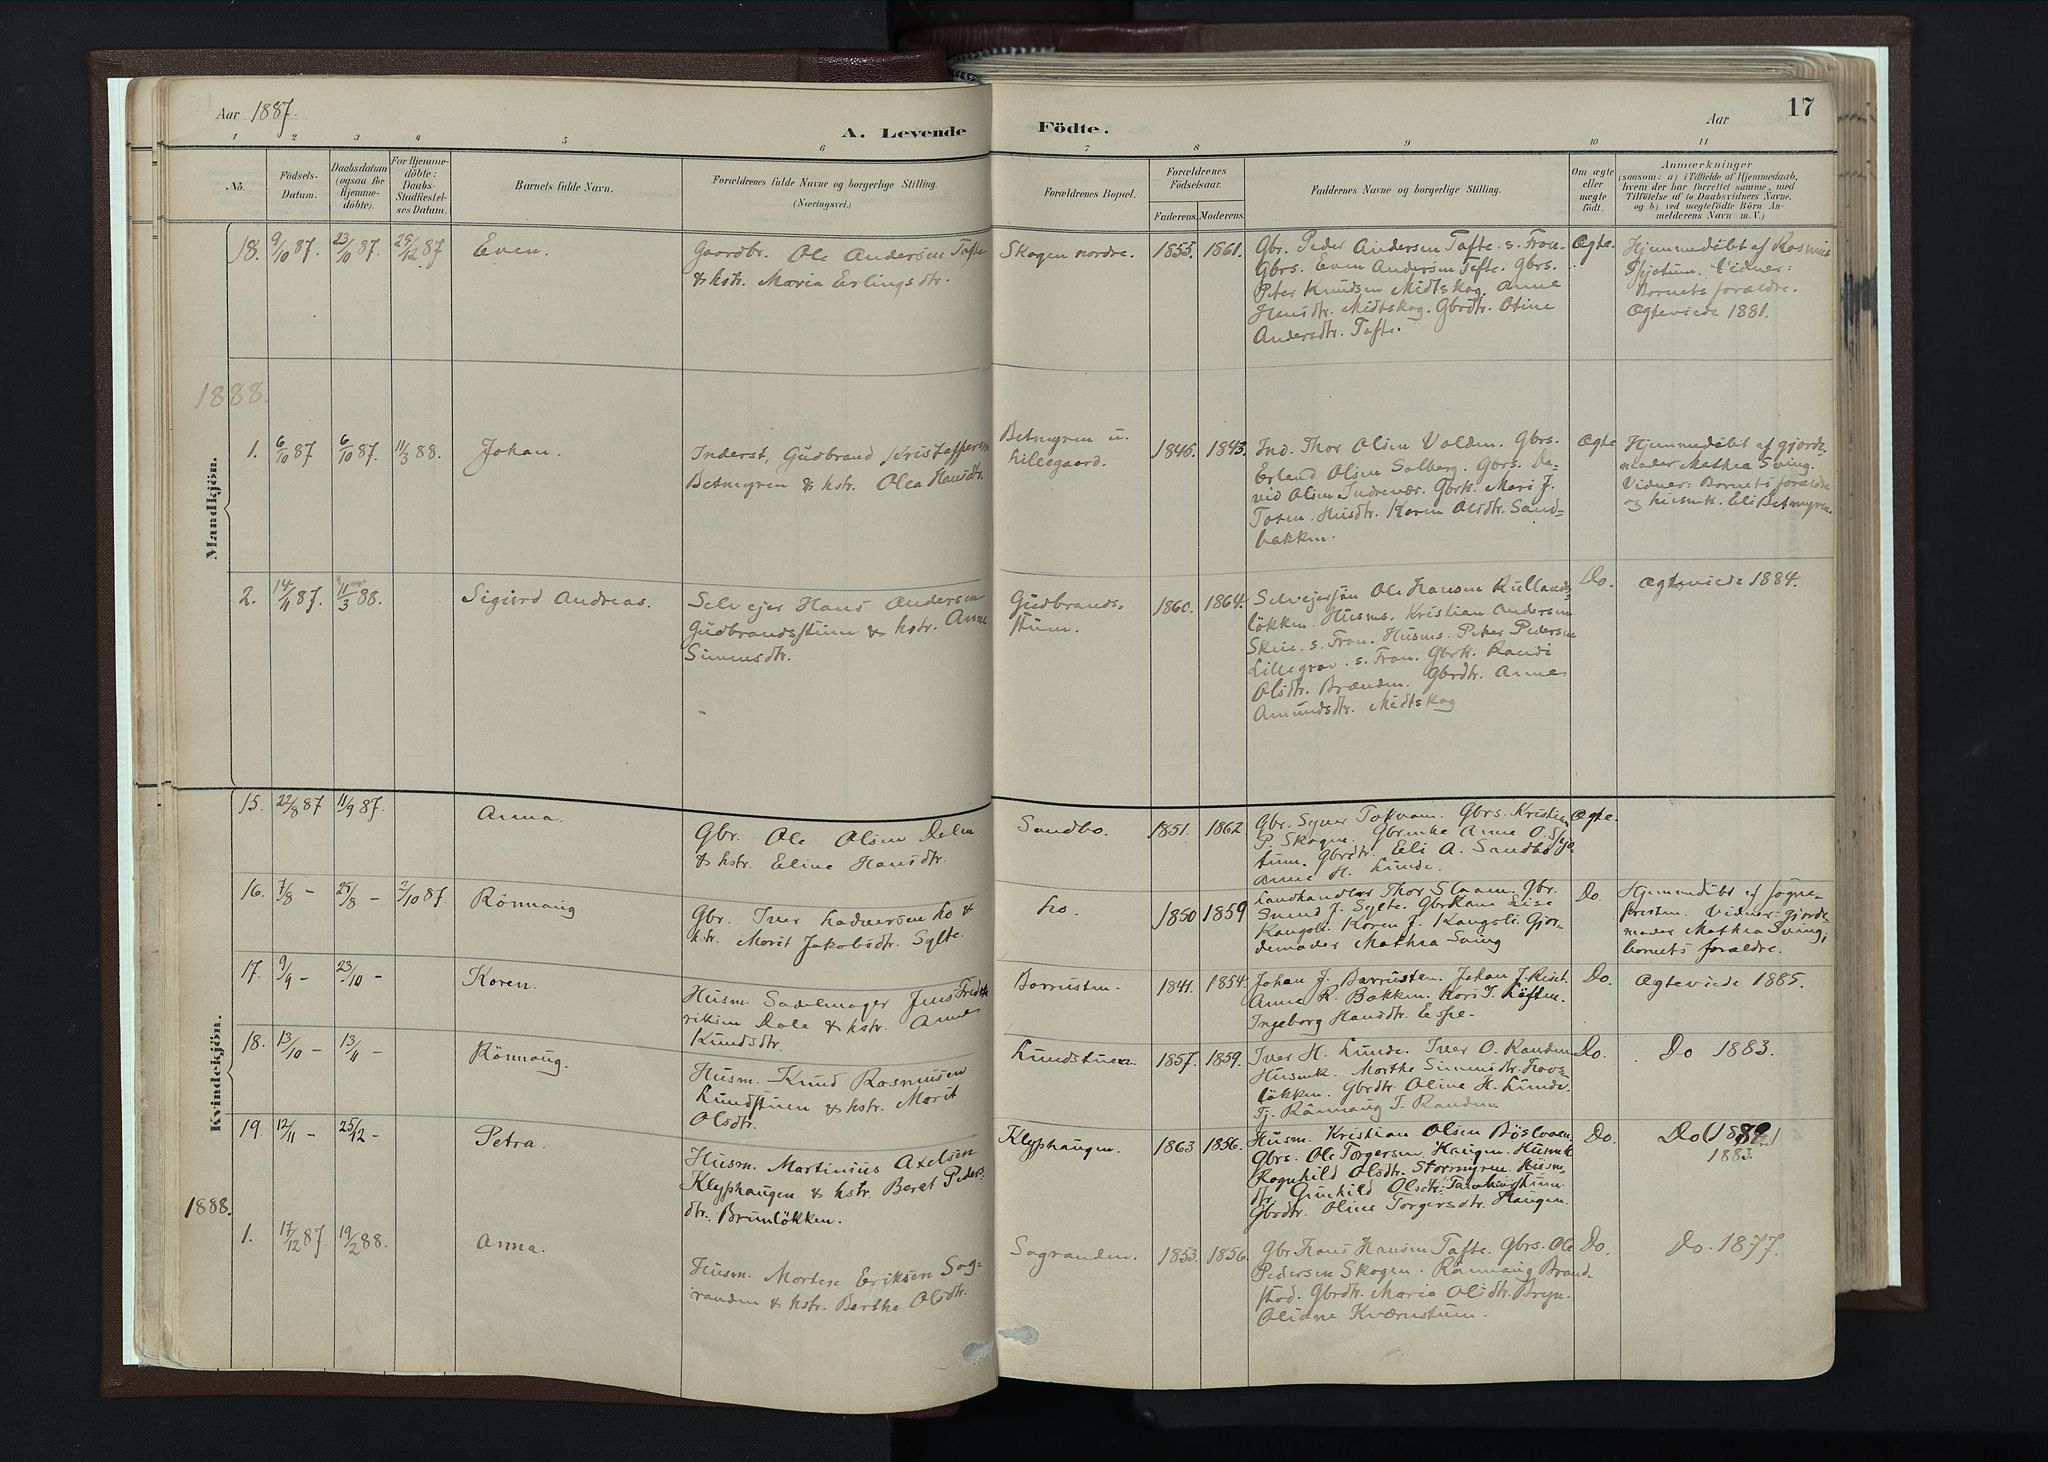 SAH, Nord-Fron prestekontor, Ministerialbok nr. 4, 1884-1914, s. 17